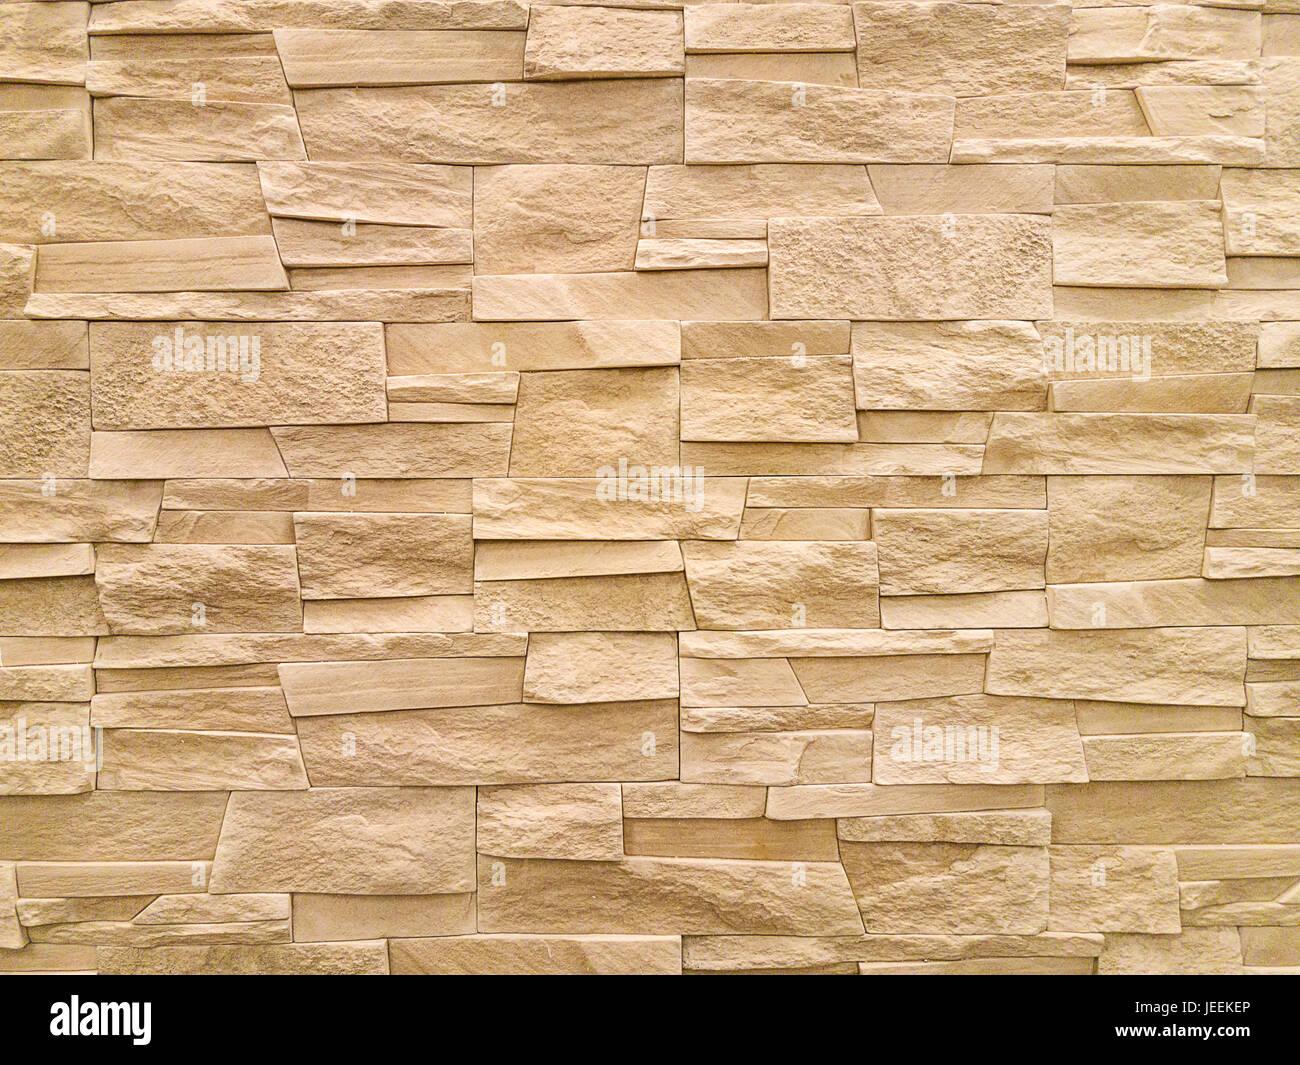 Enchanting How To Build A Decorative Block Wall Elaboration - Wall ...